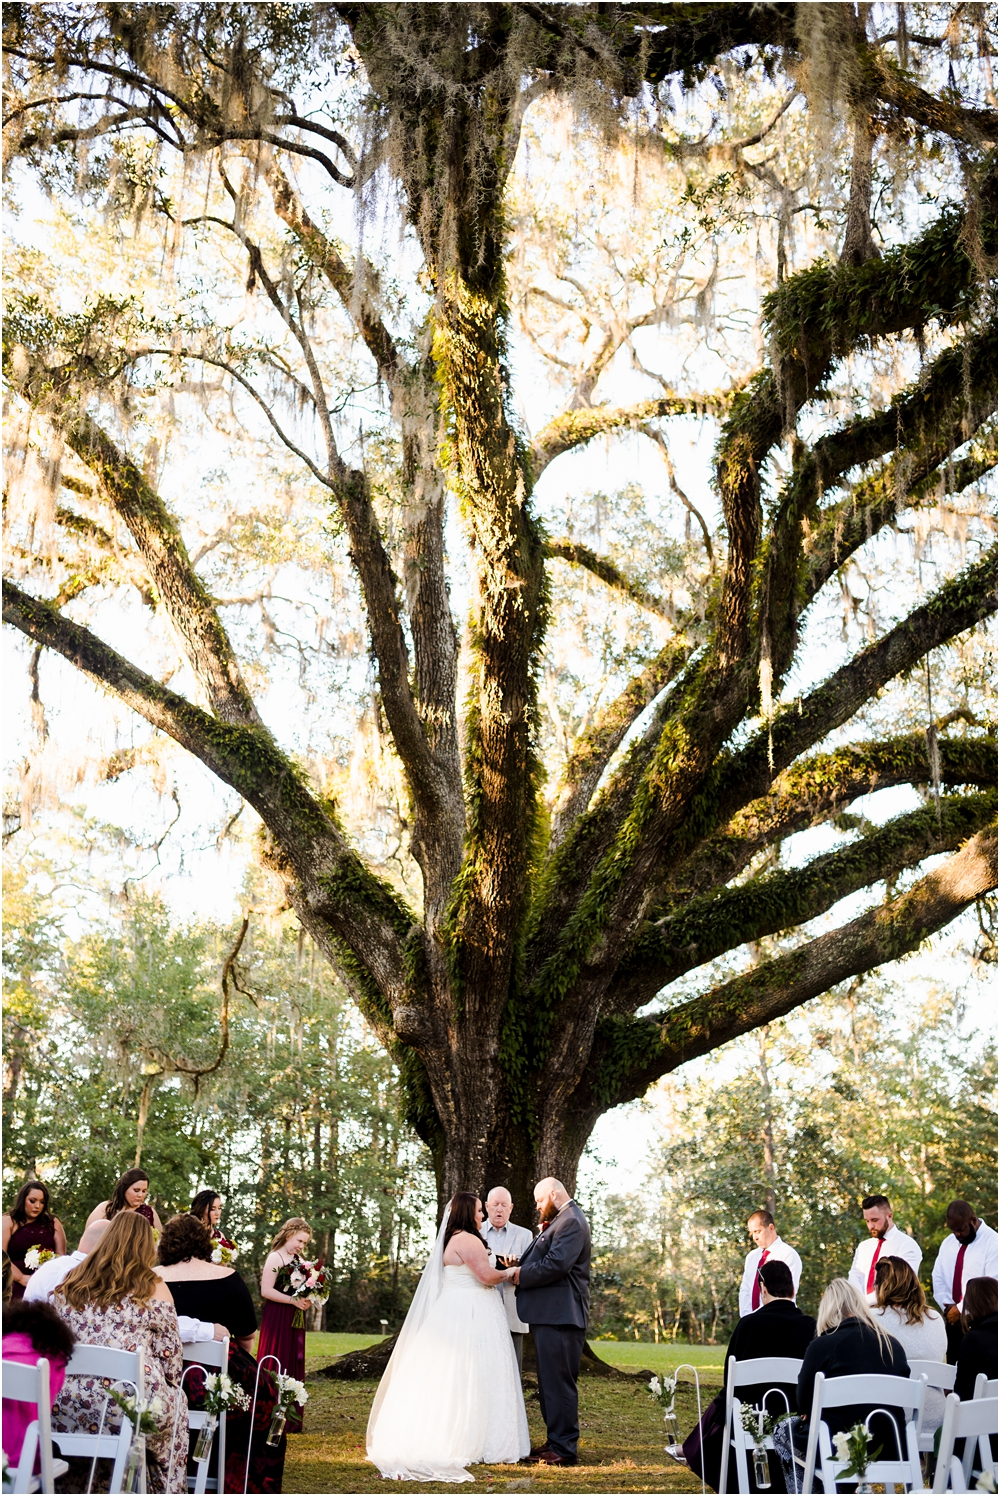 Eden-Gardens-florida-wedding-photographer-kiersten-stevenson-photography-65.jpg